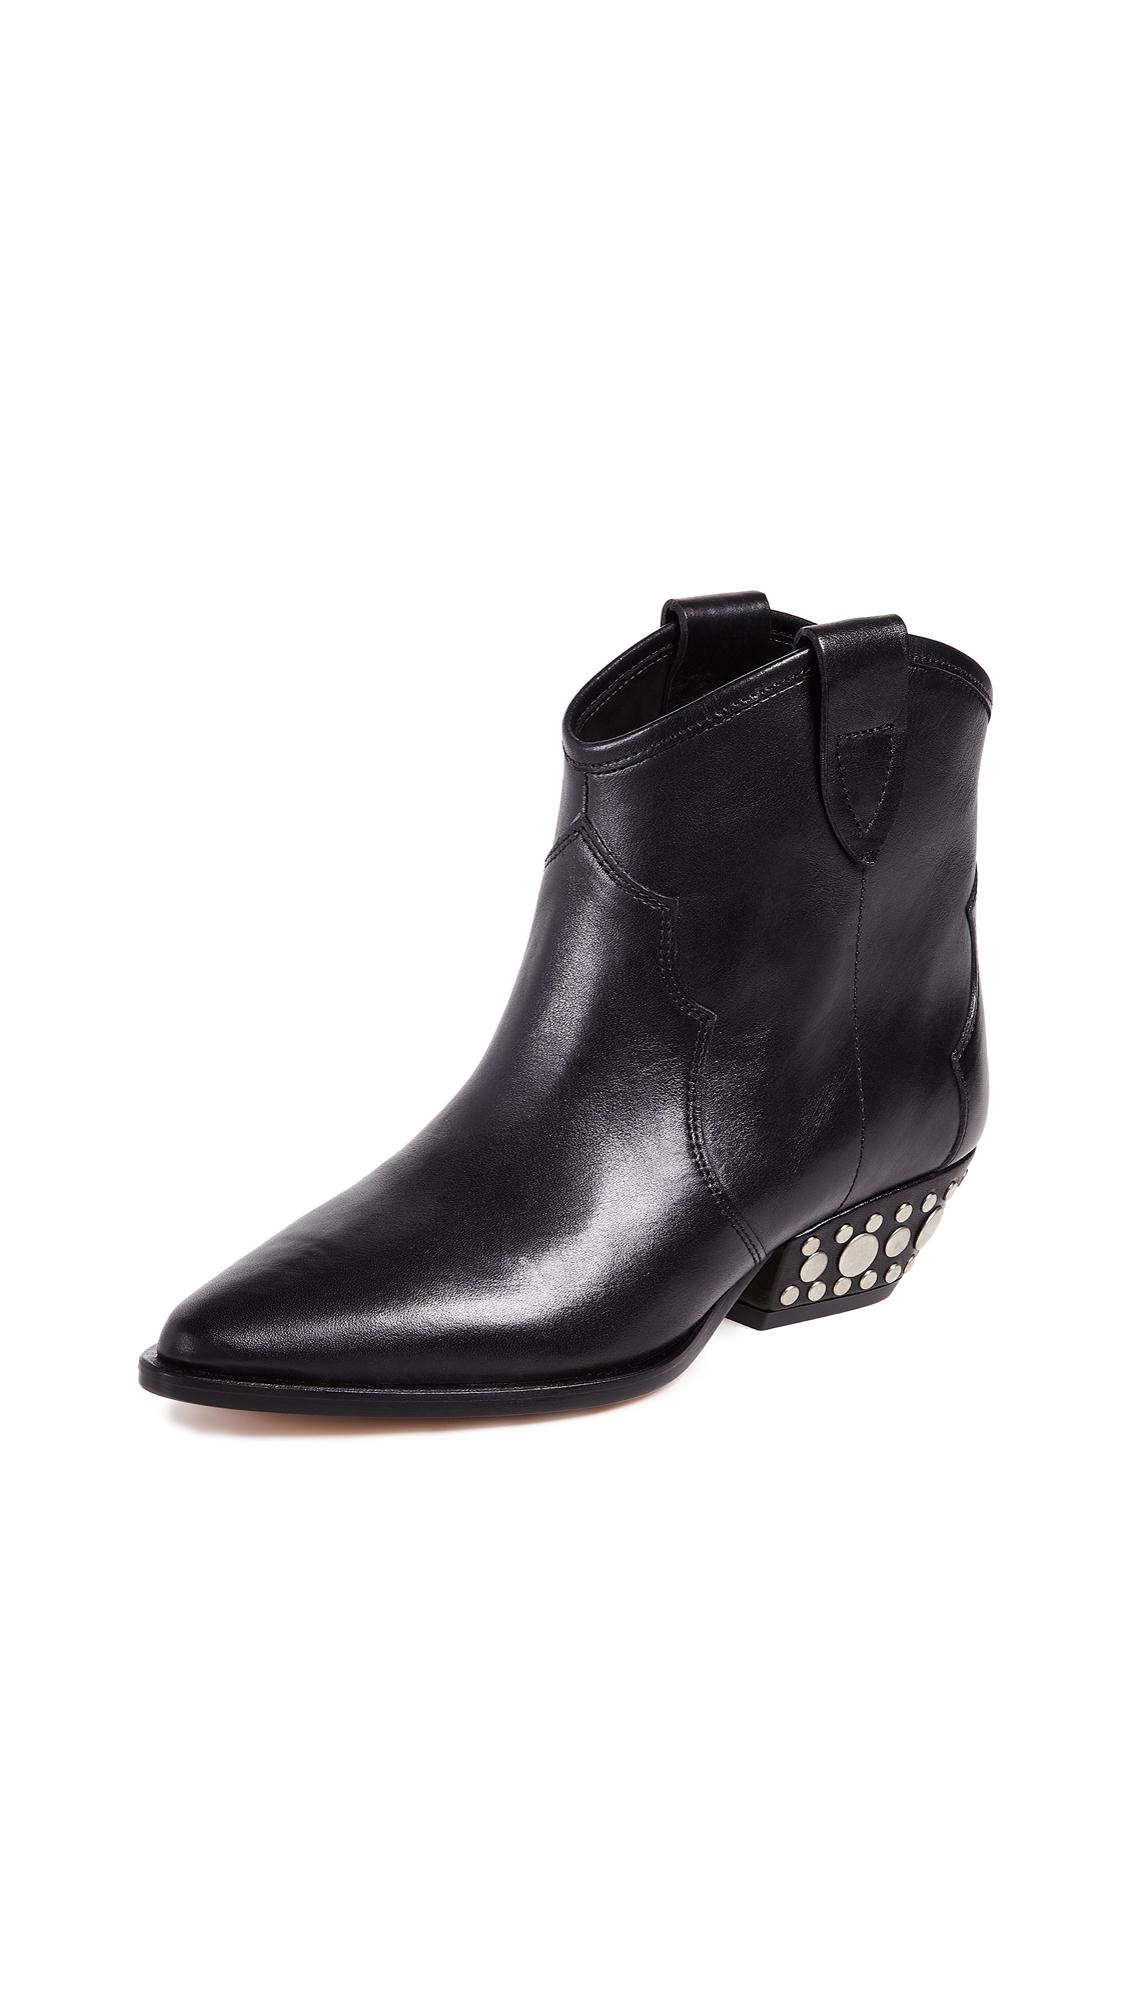 Isabel Marant Dawyna Boots - Black